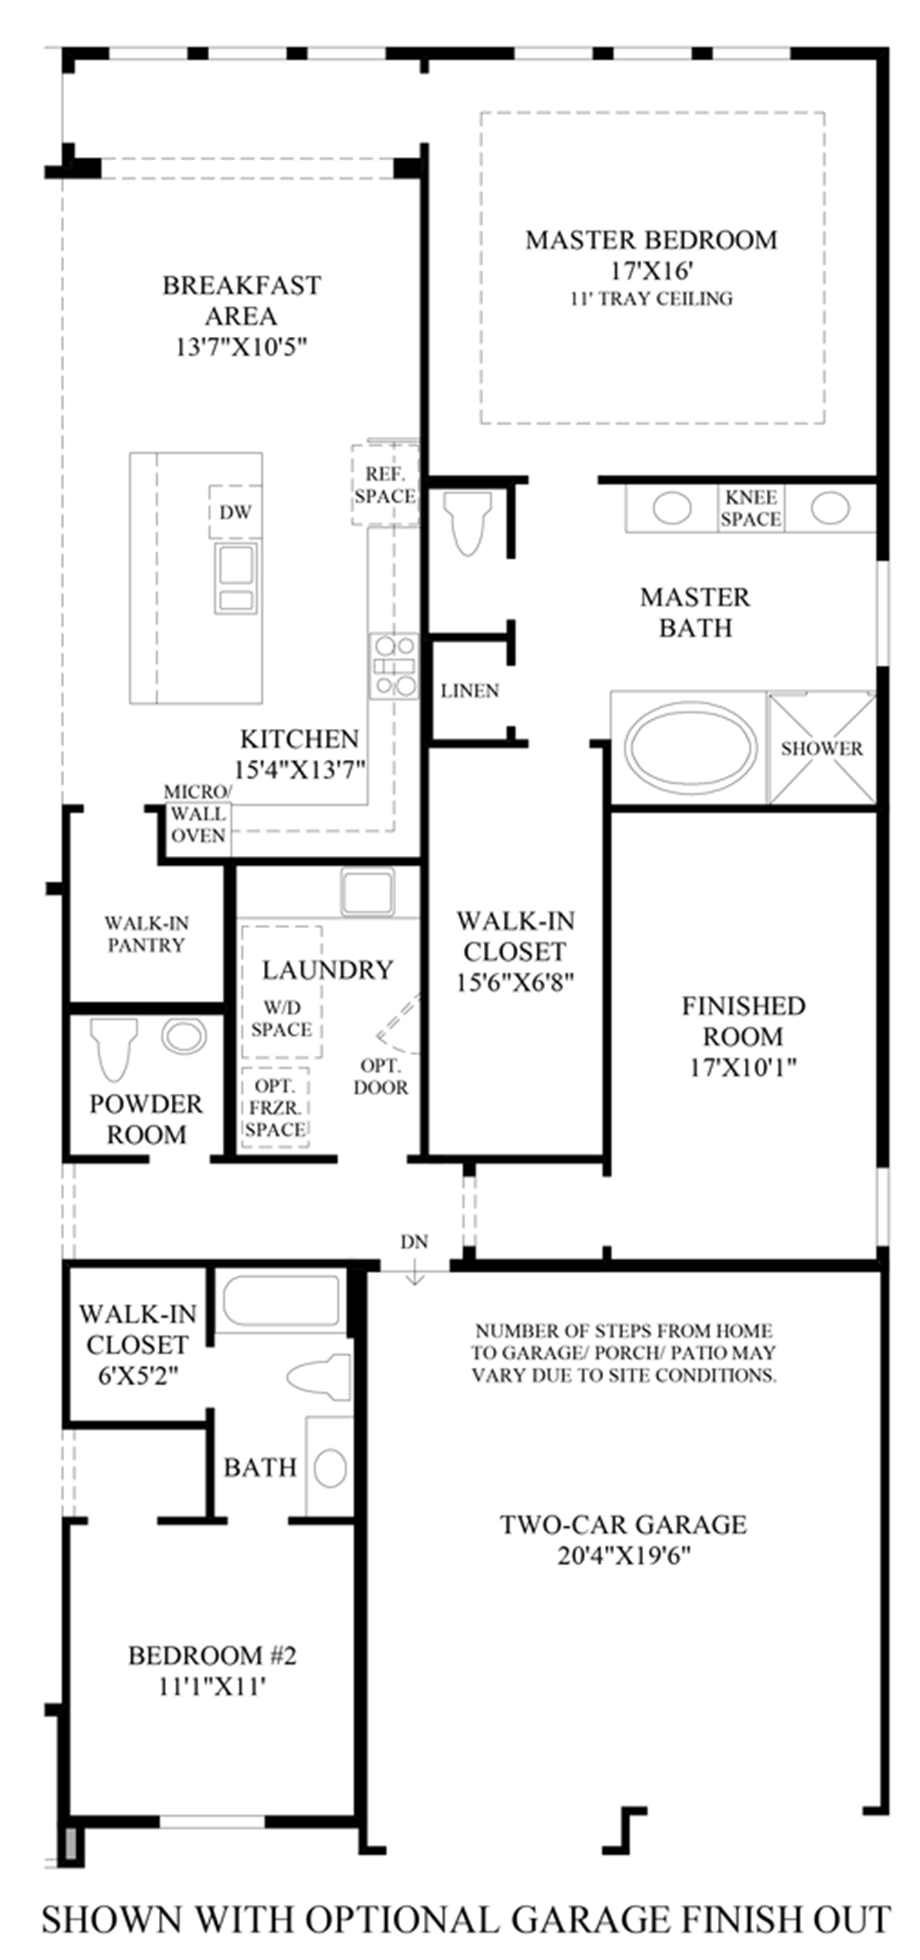 Optional Garage Finish Out Floor Plan